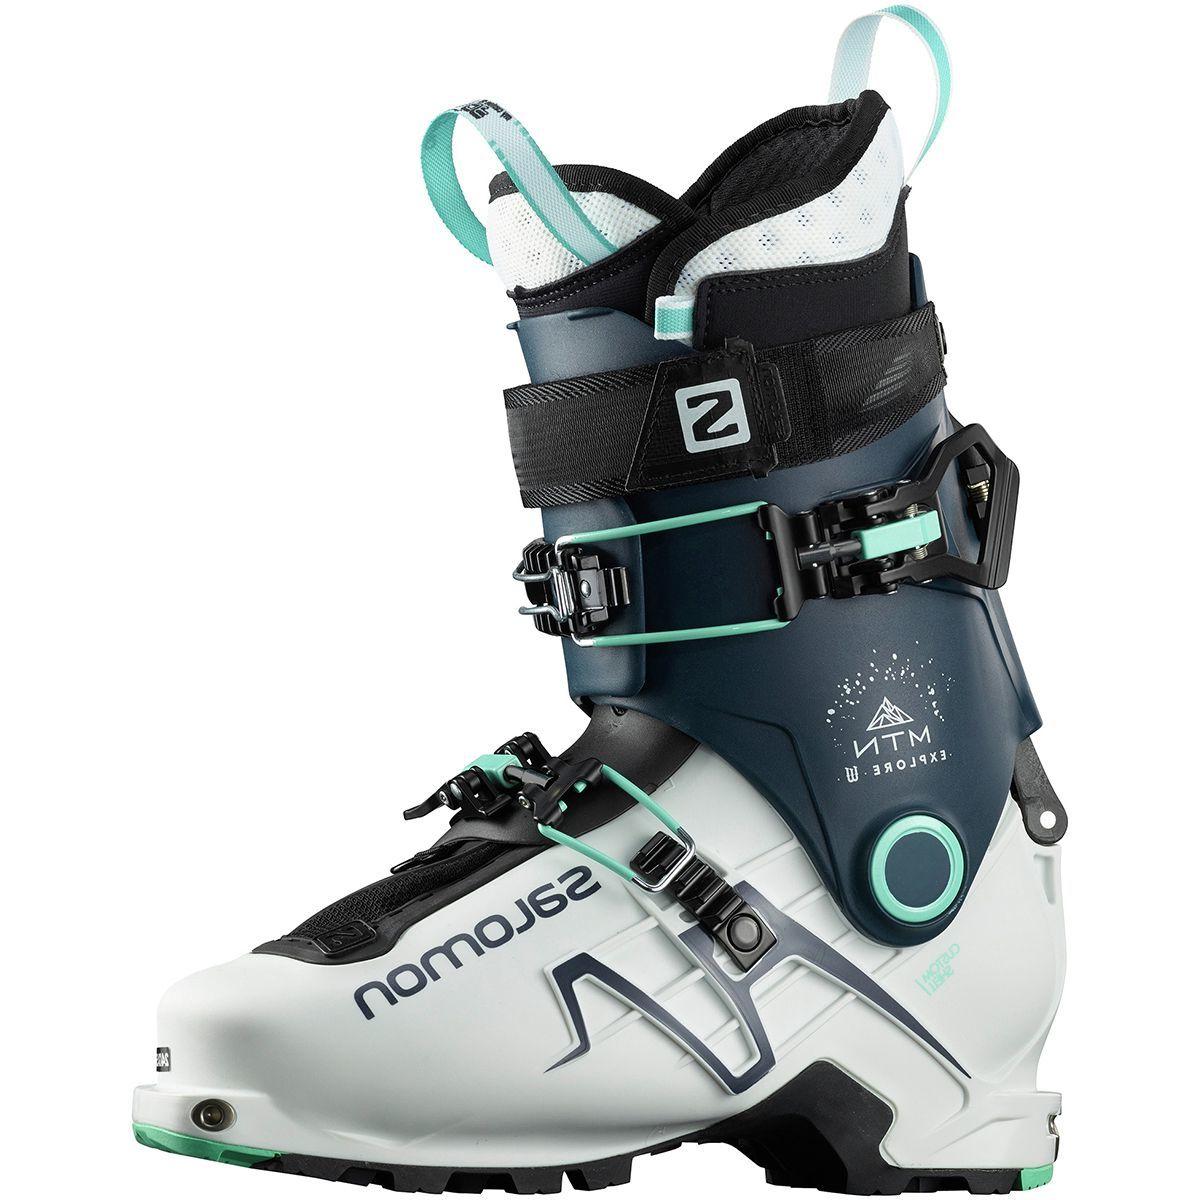 Salomon MTN Explore Ski Boot - Women's